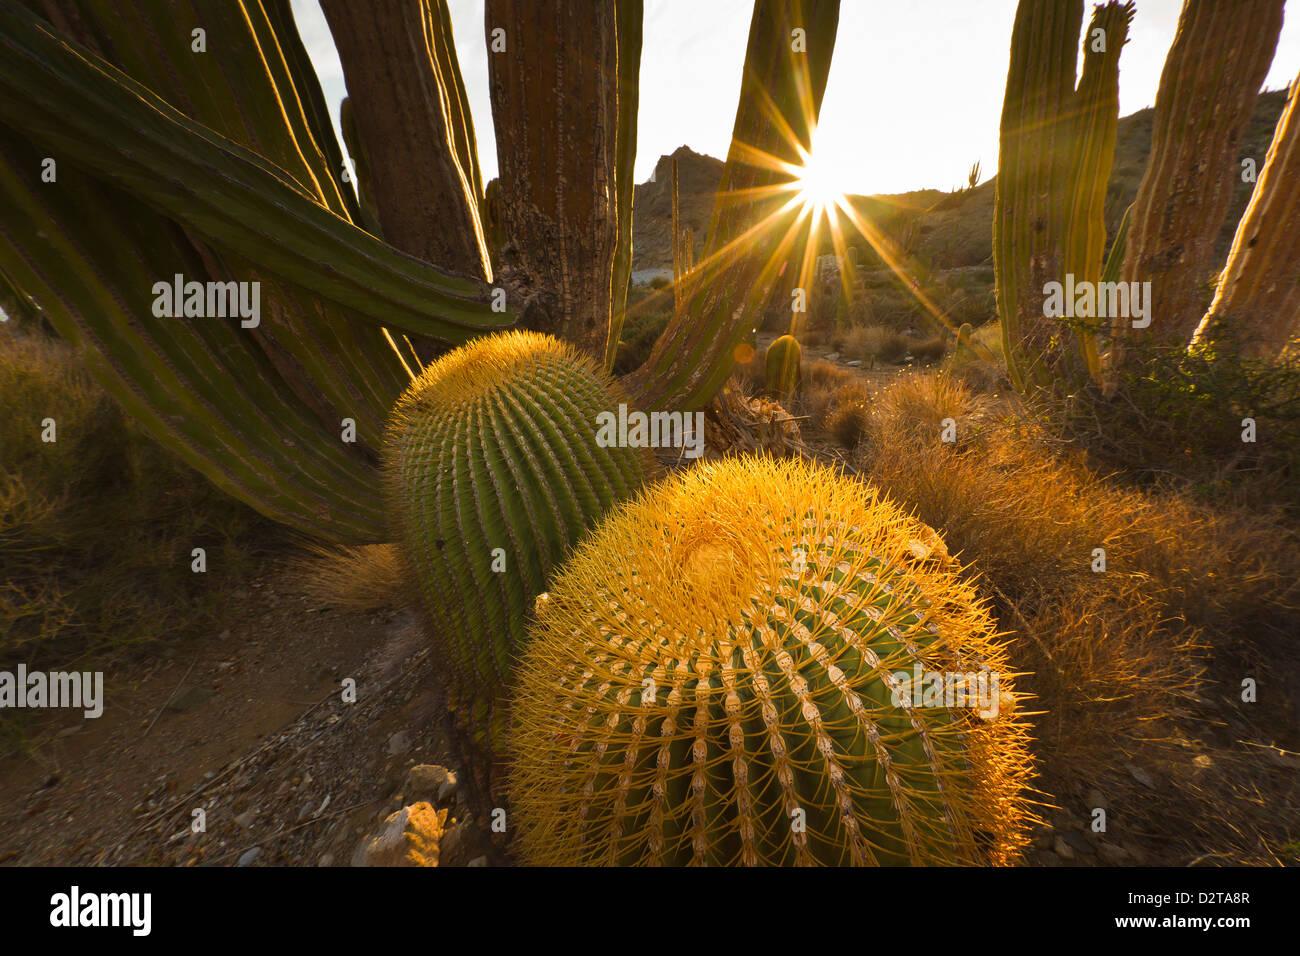 Endemic giant barrel cactus, Isla Santa Catalina, Gulf of California (Sea of Cortez), Baja California Sur, Mexico - Stock Image